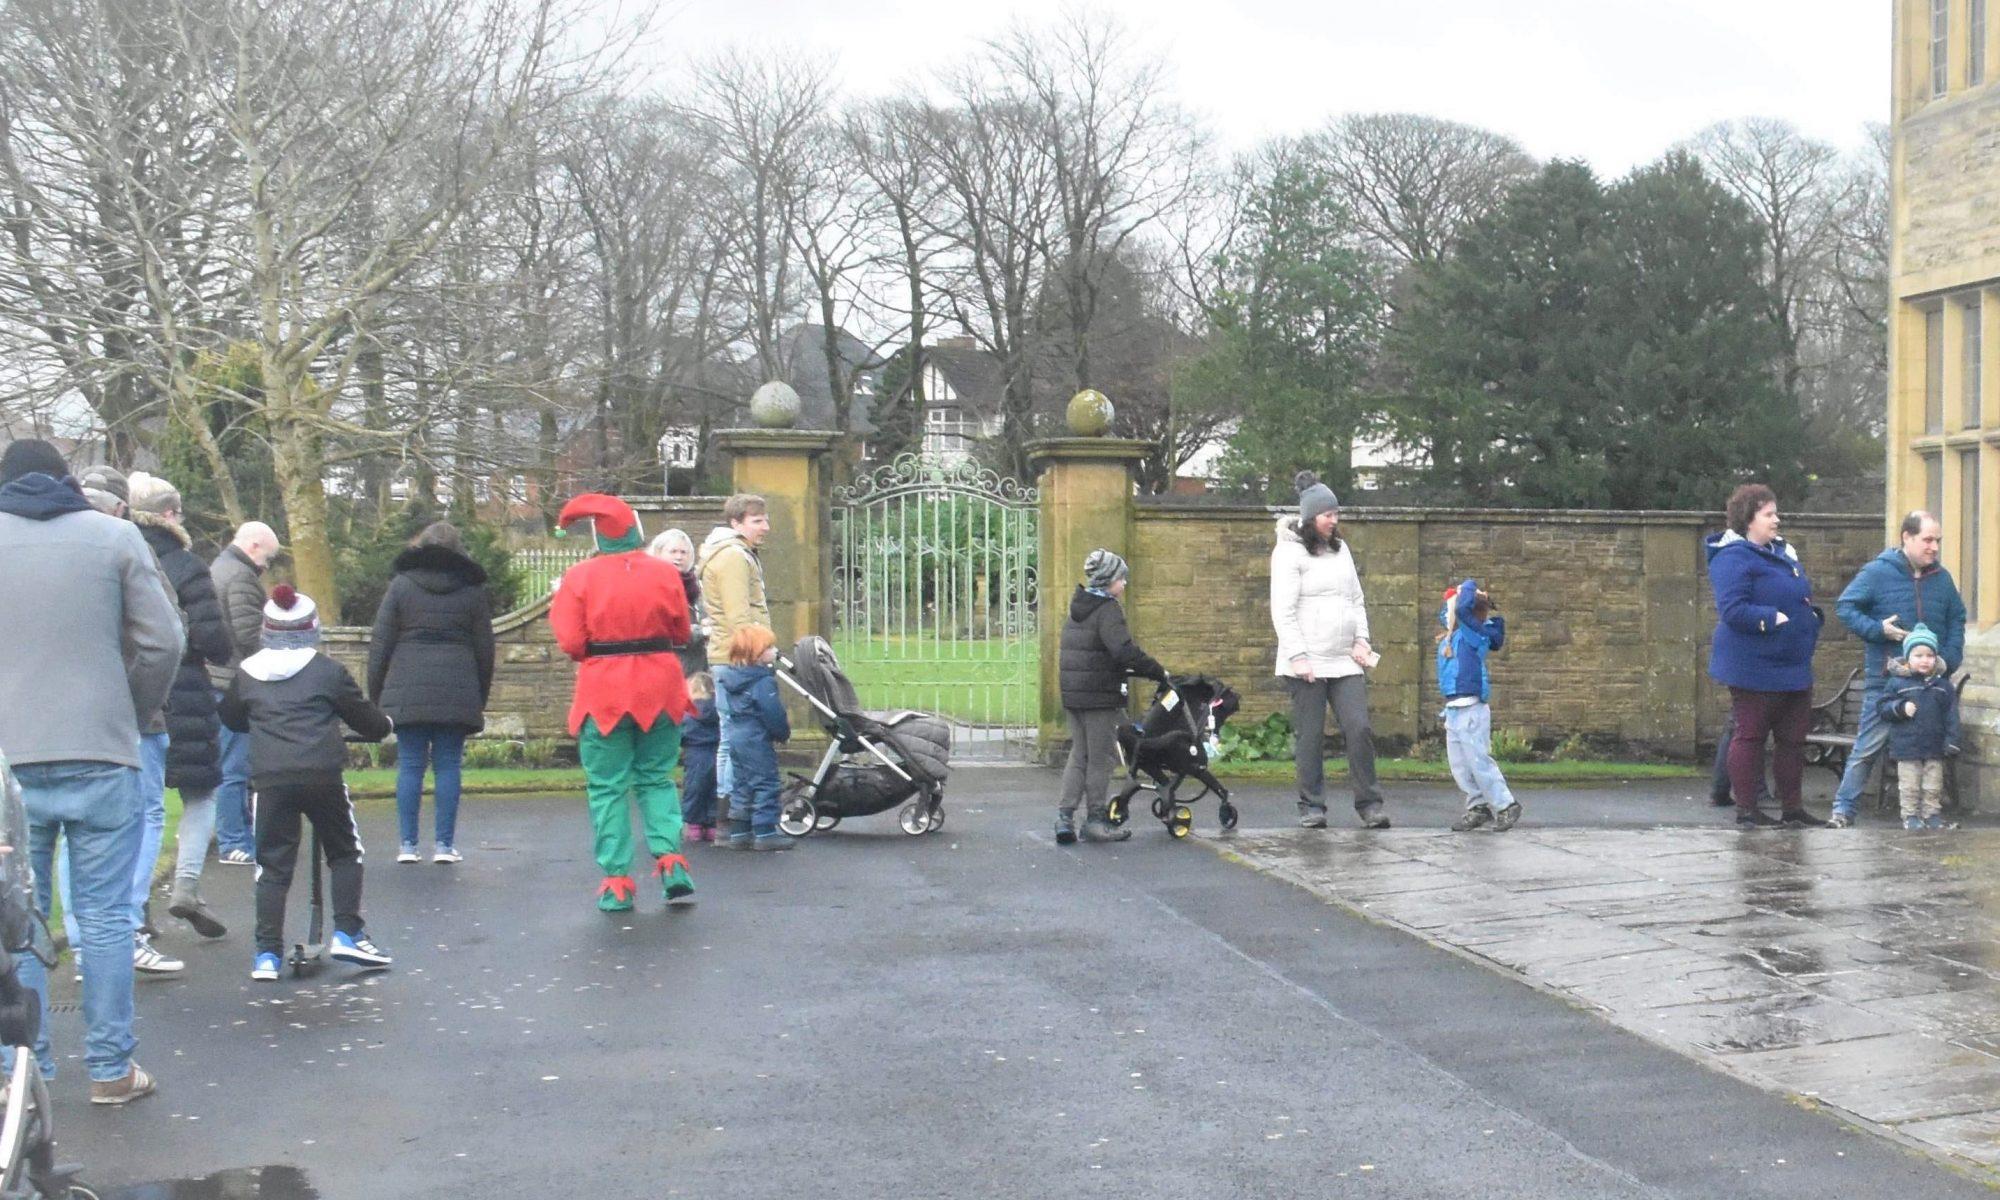 Elf Liz and visitors to see Santa